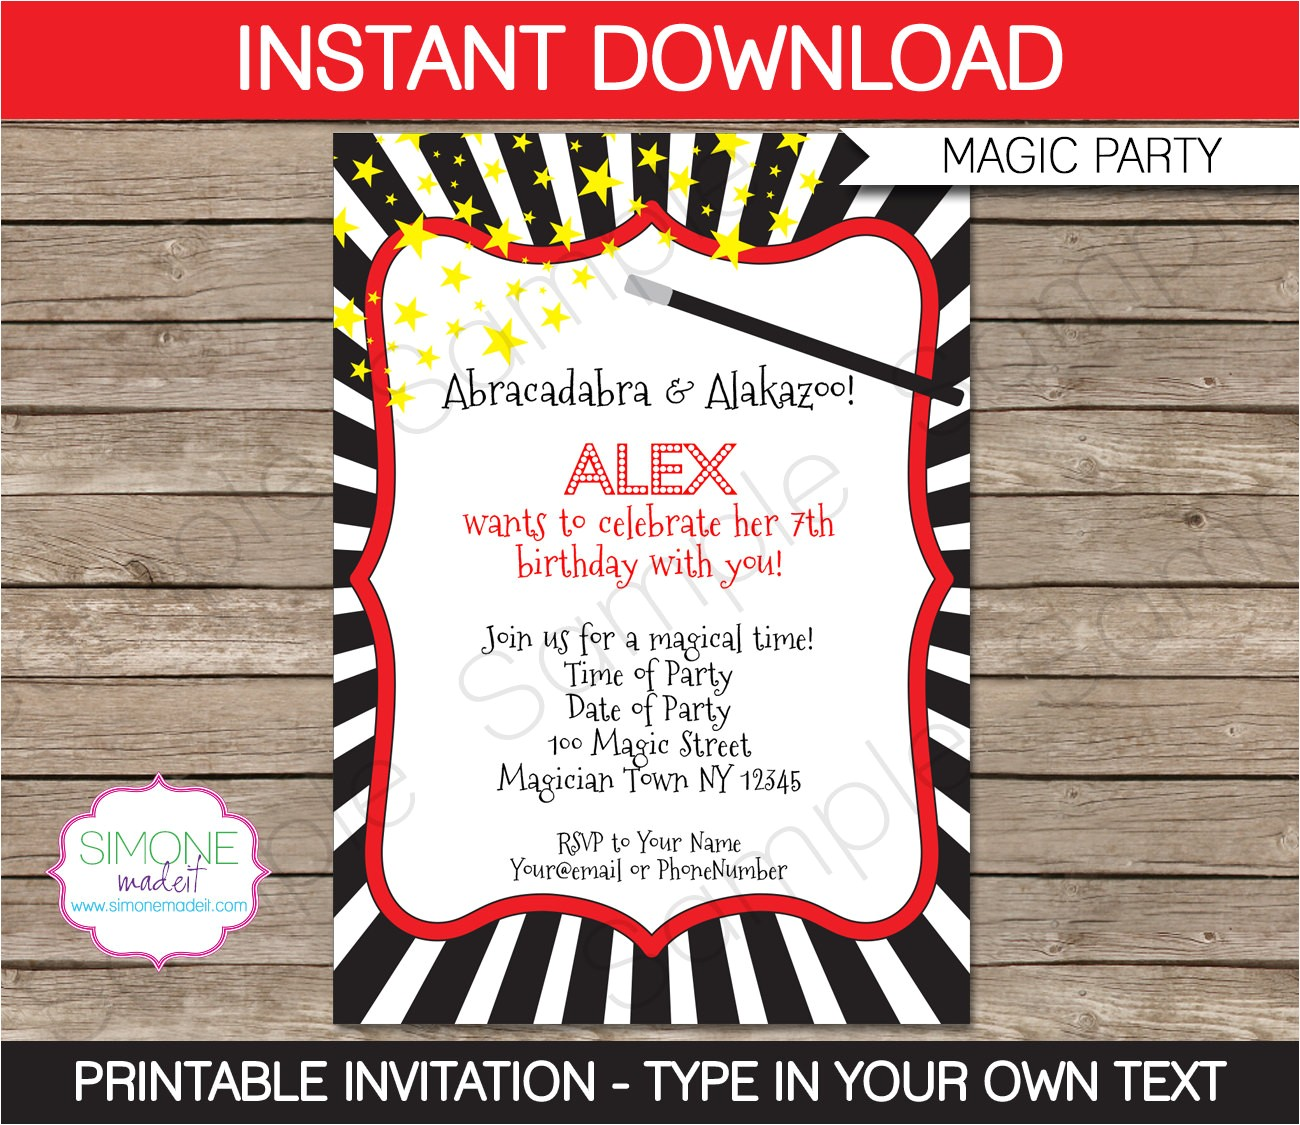 magic party invitation instant